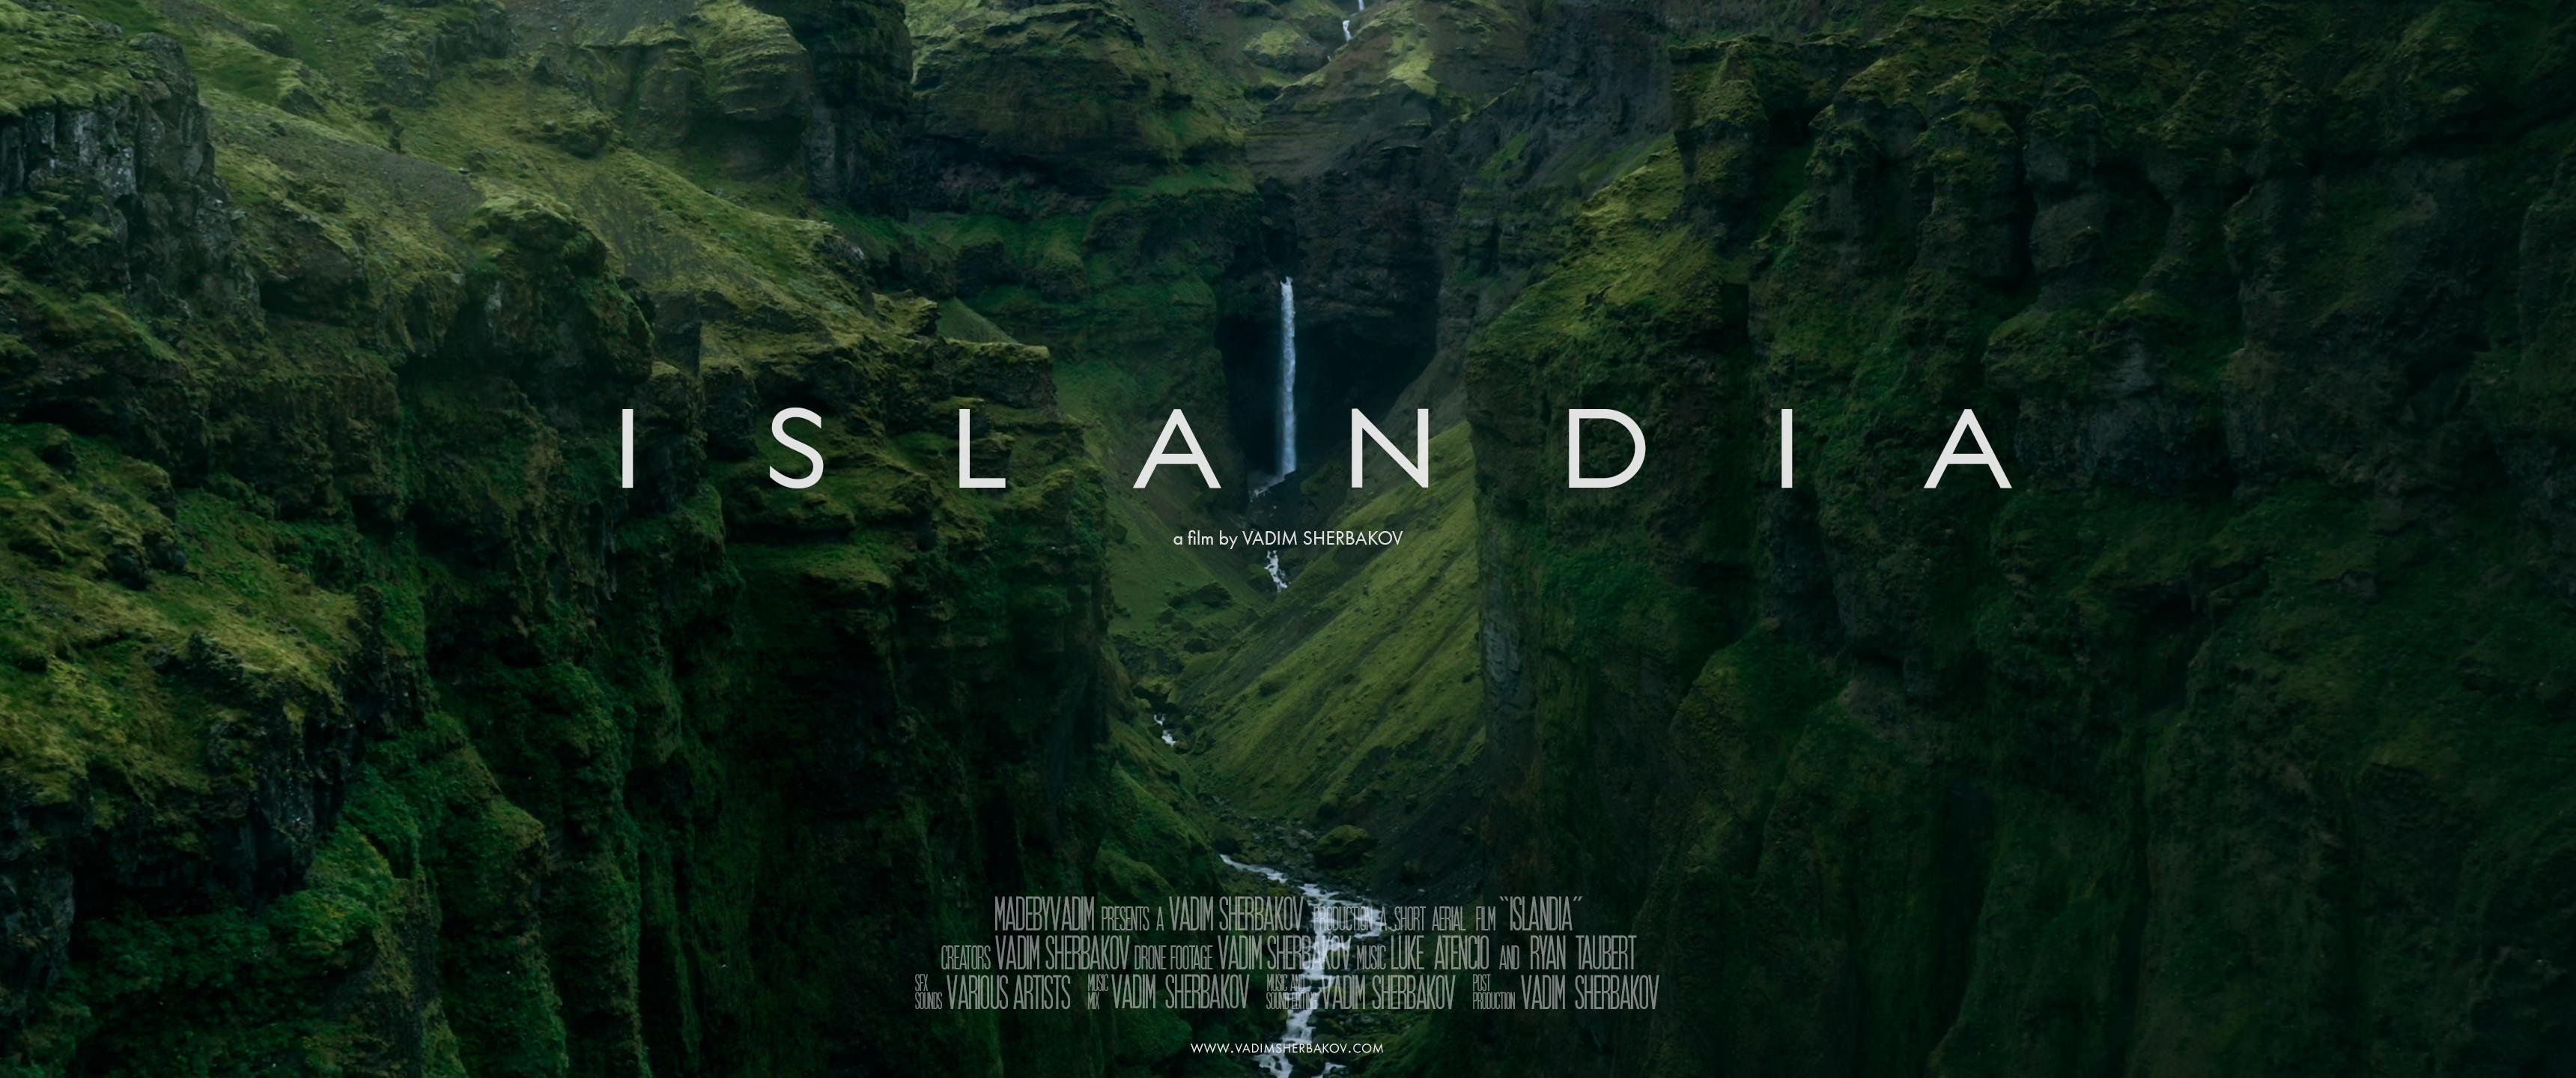 Islandia-Cover-horizontal.jpg